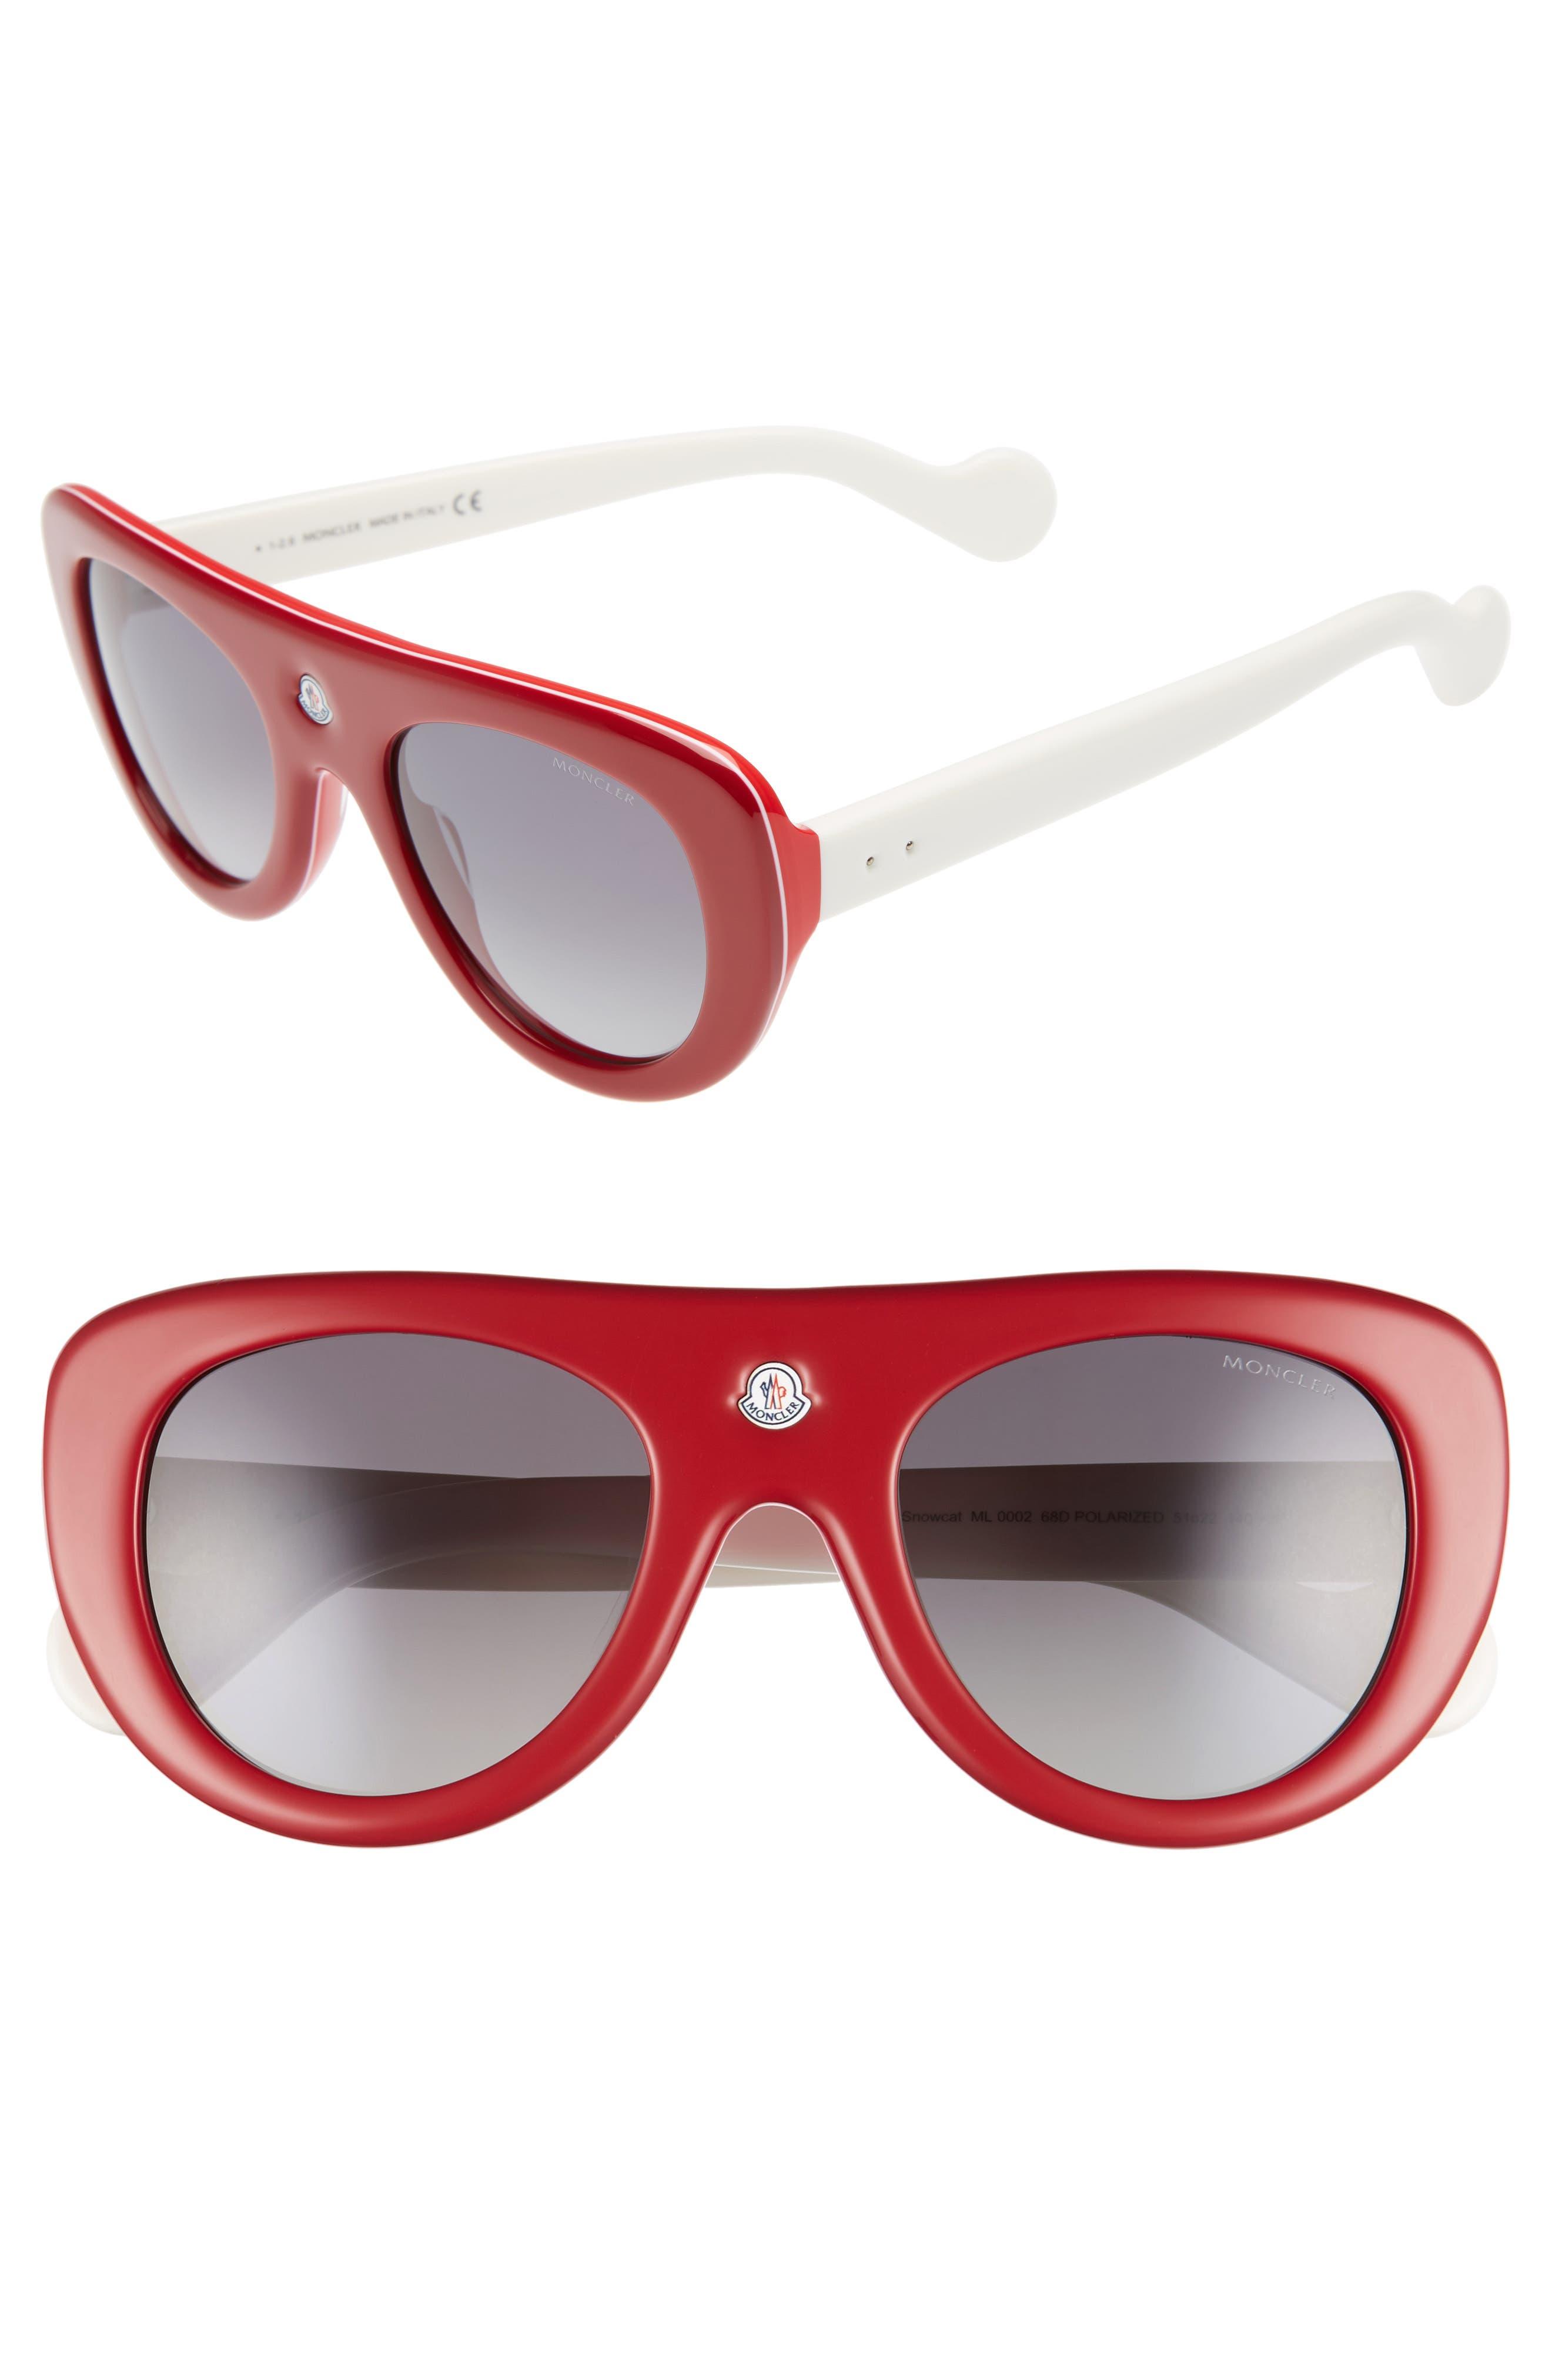 Moncler 51mm Polarized Two-Tone Geometric Sunglasses